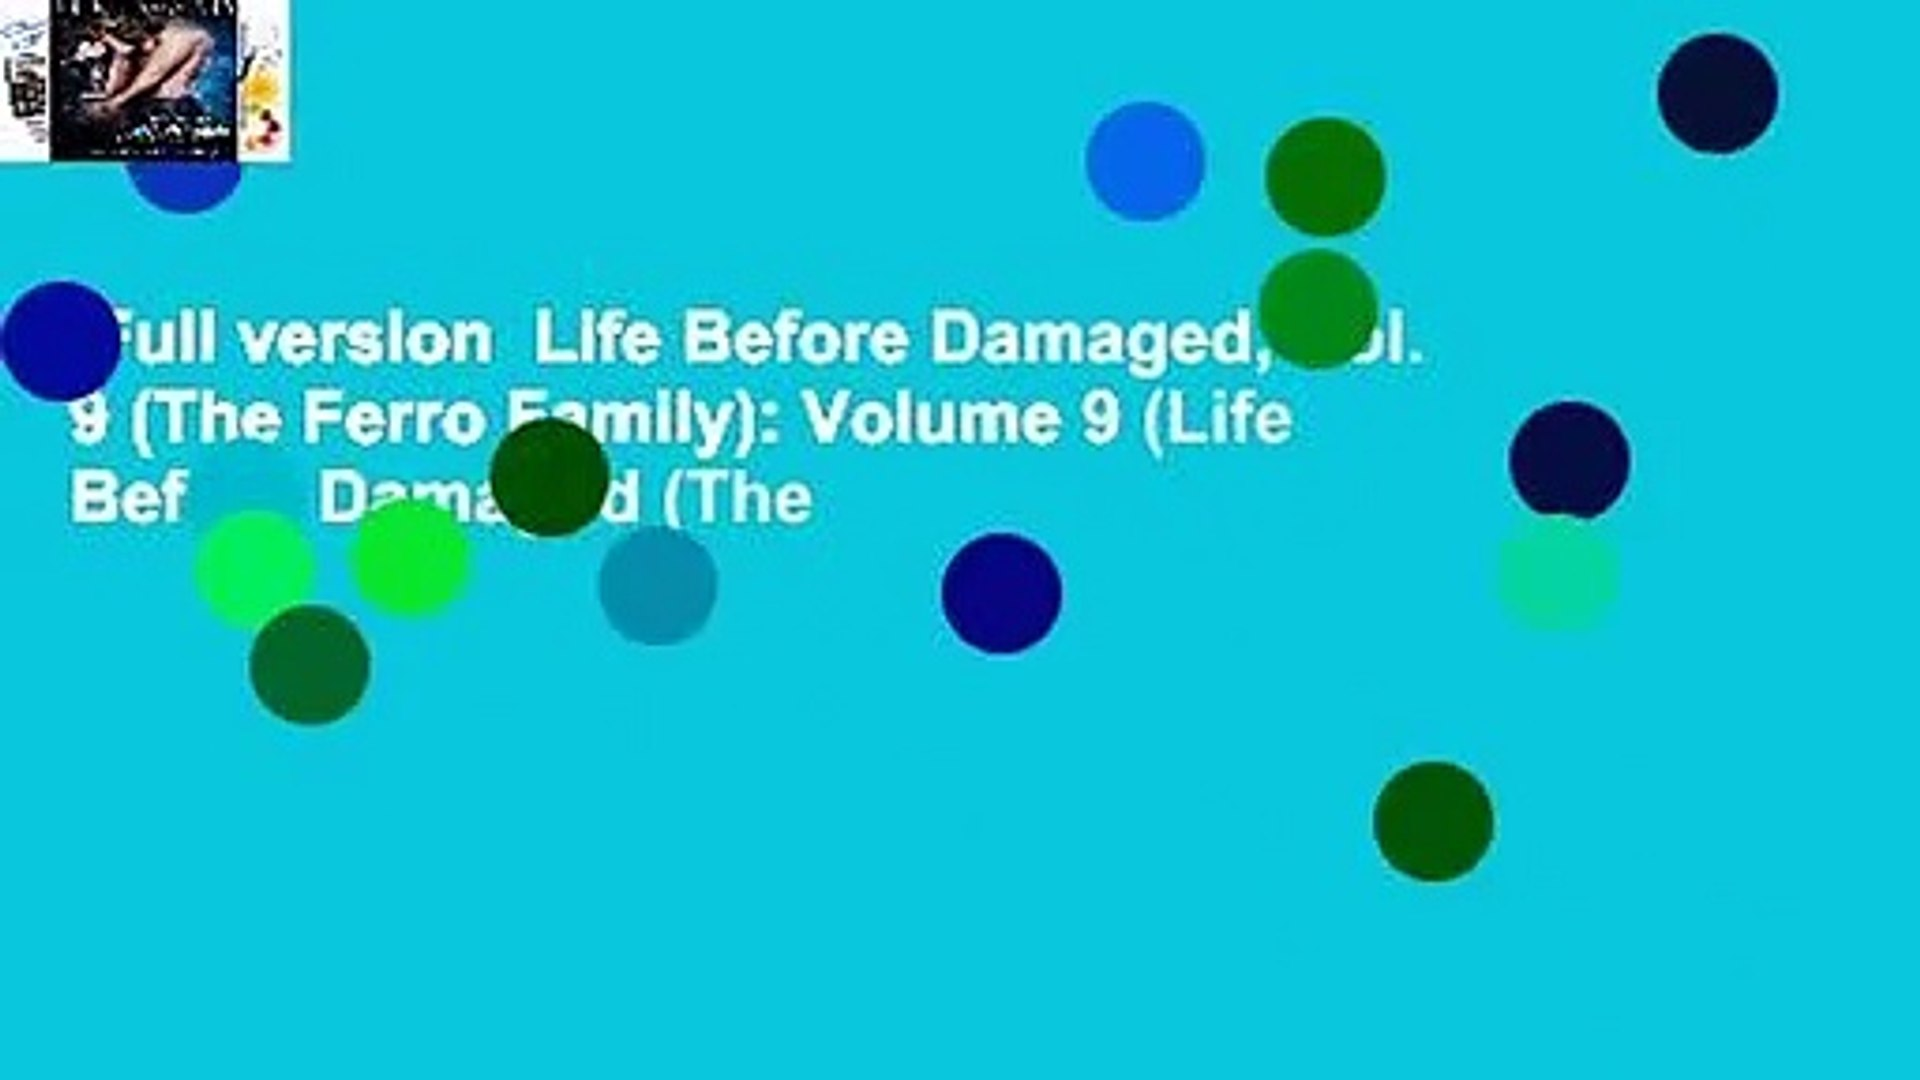 Full version  Life Before Damaged, Vol. 9 (The Ferro Family): Volume 9 (Life Before Damaged (The